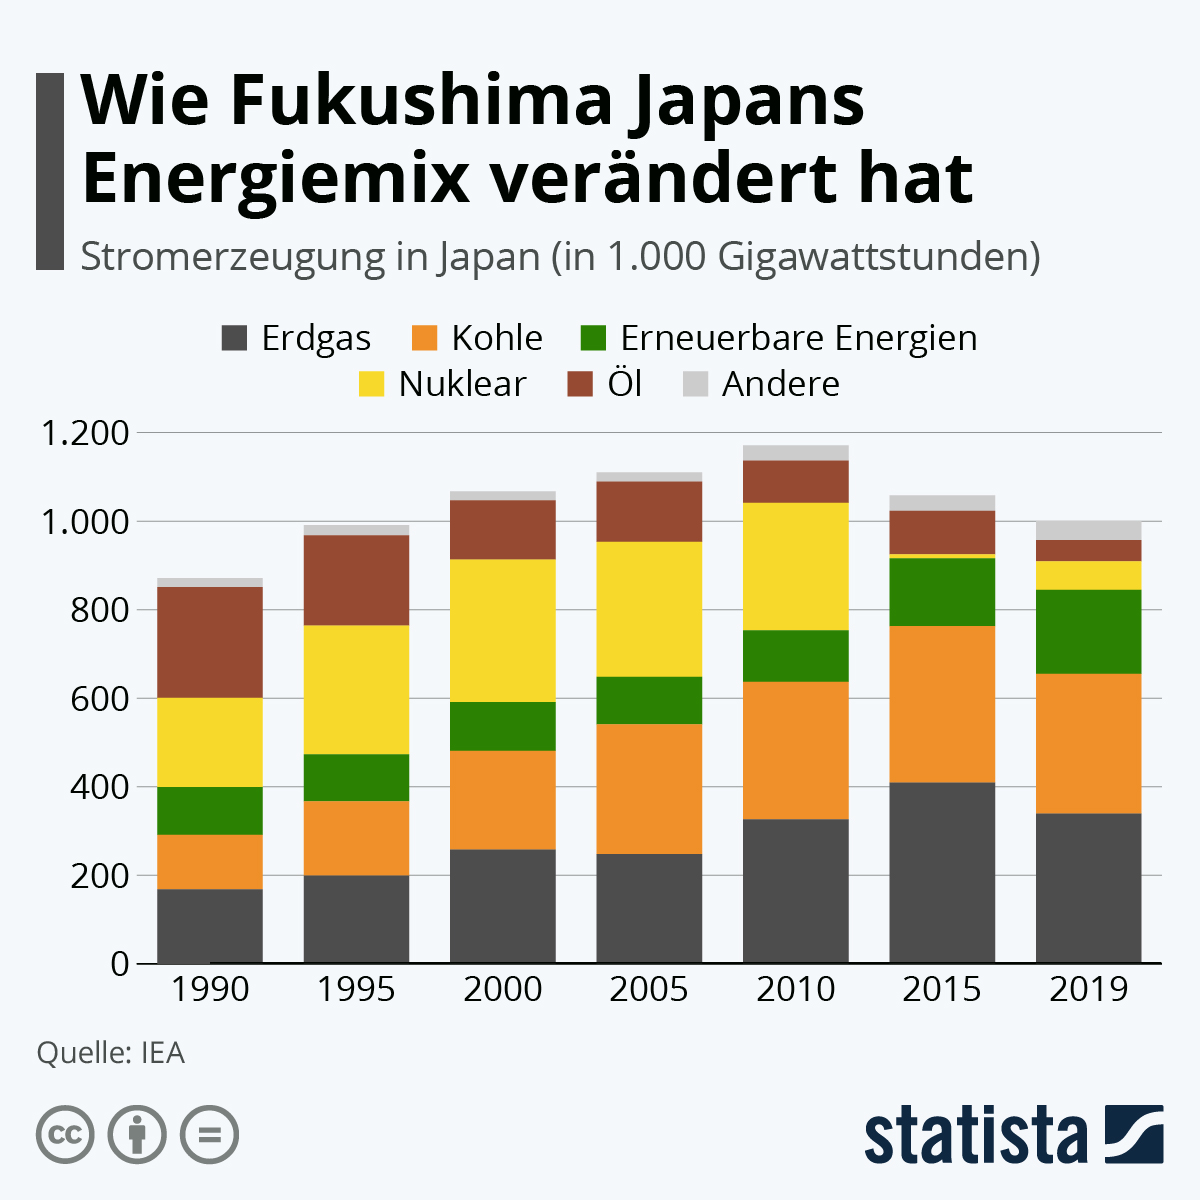 Wie Fukushima Japans Energiemix verändert hat | Statista